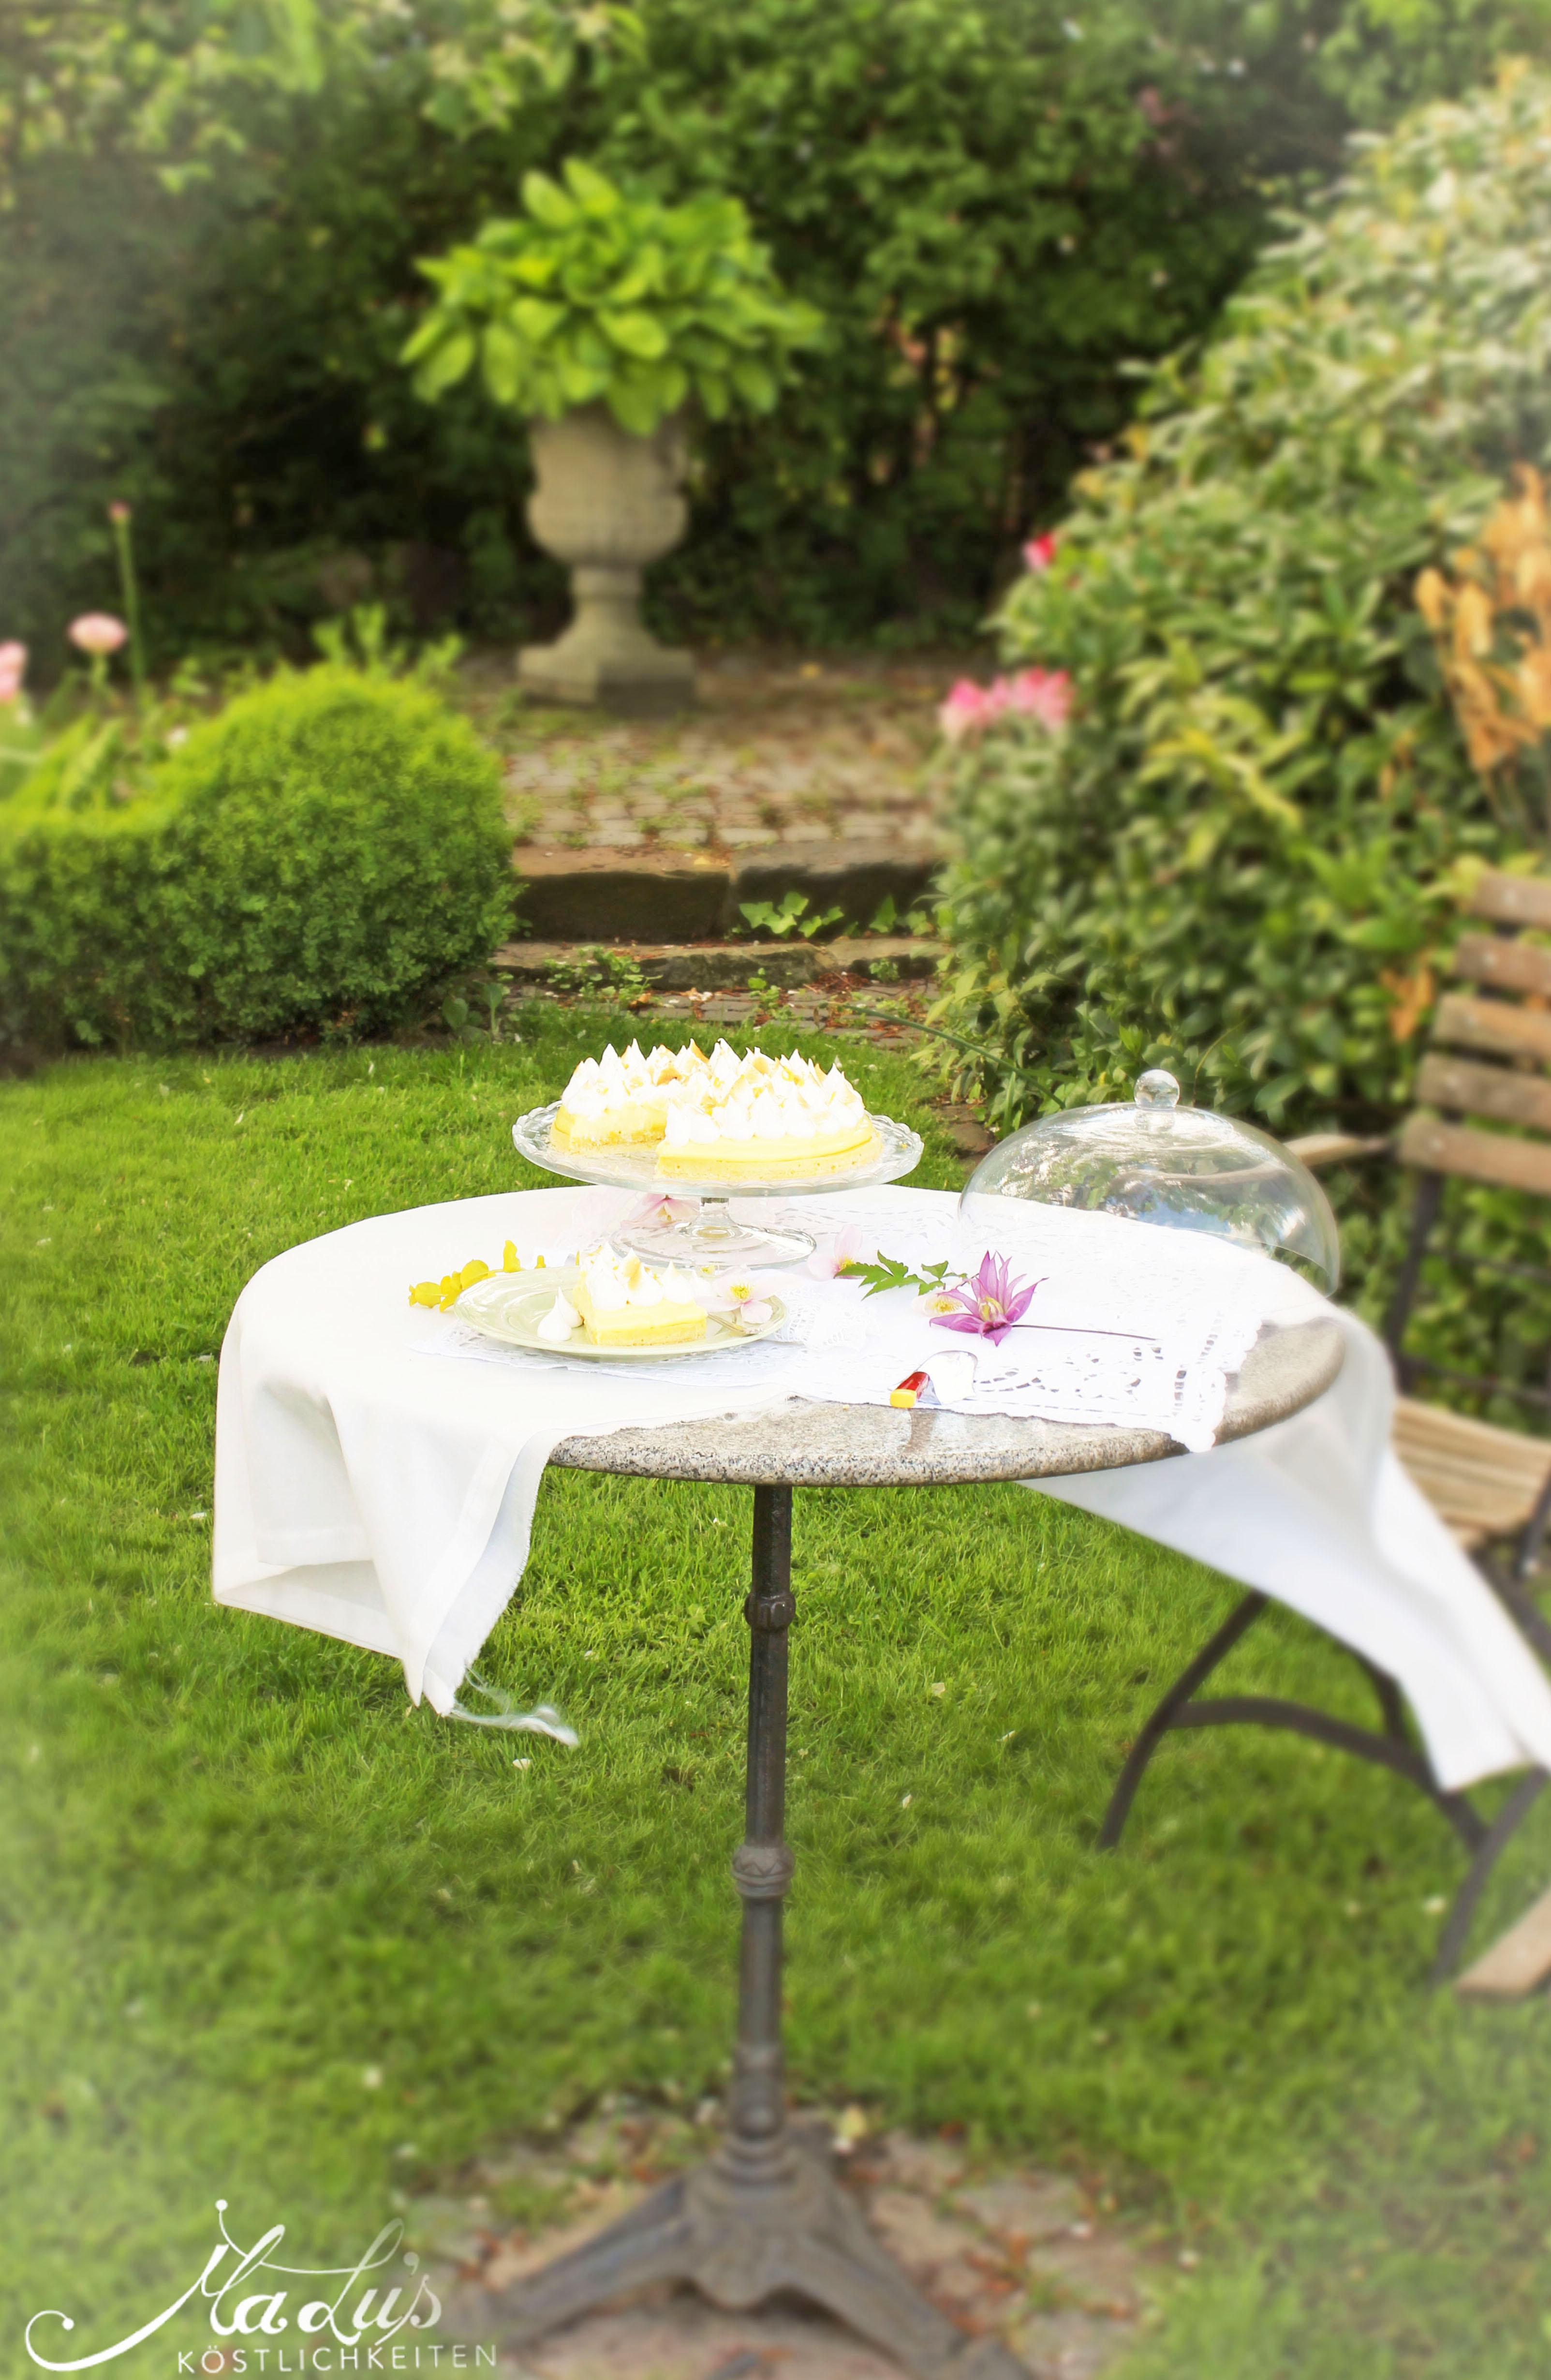 Fannys Tarte au citron